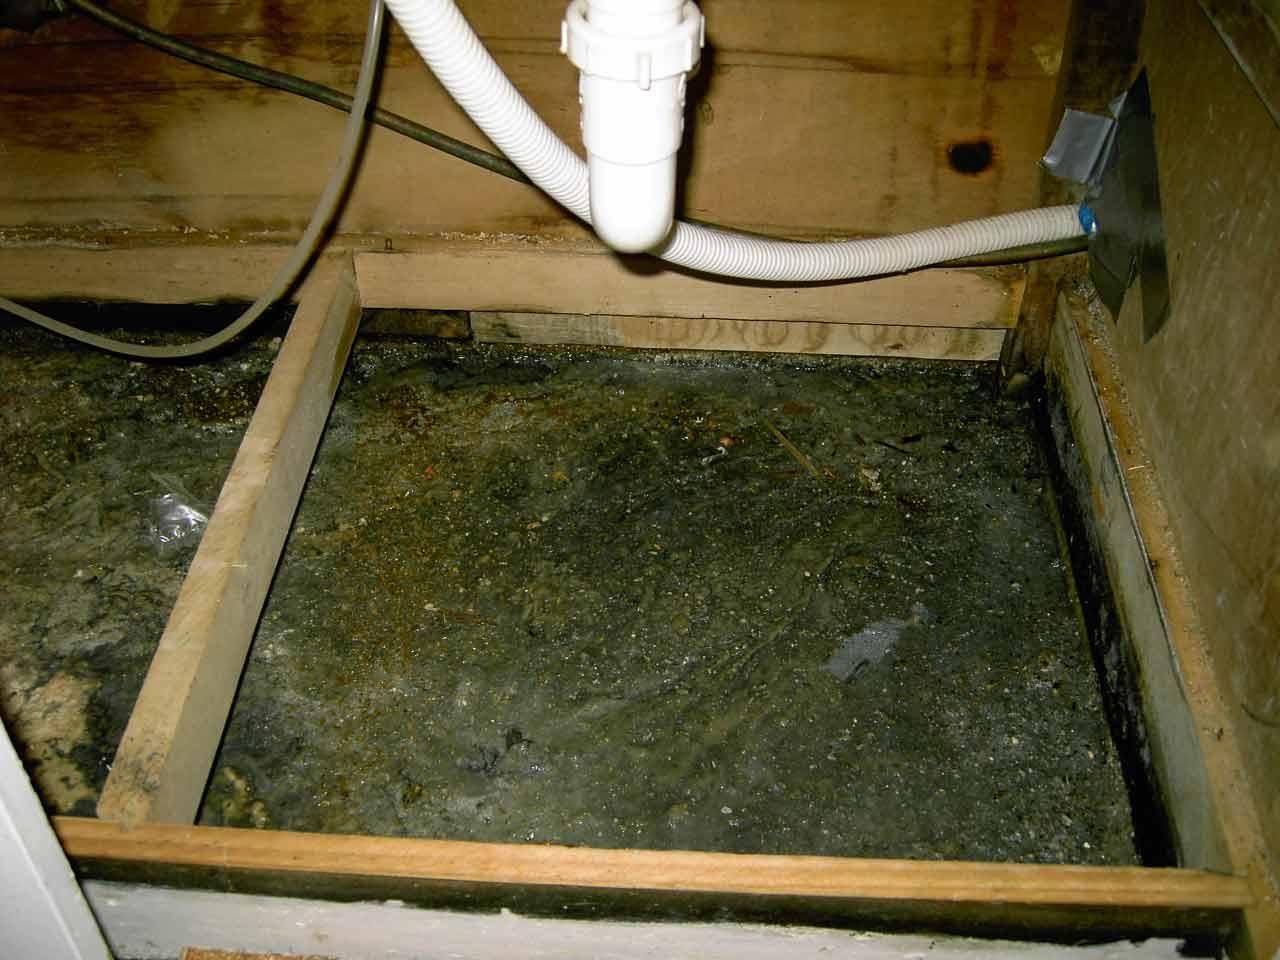 Black Mold In Kitchen Mold Under Sink Plumbing Diy Home Improvement Diychatroom